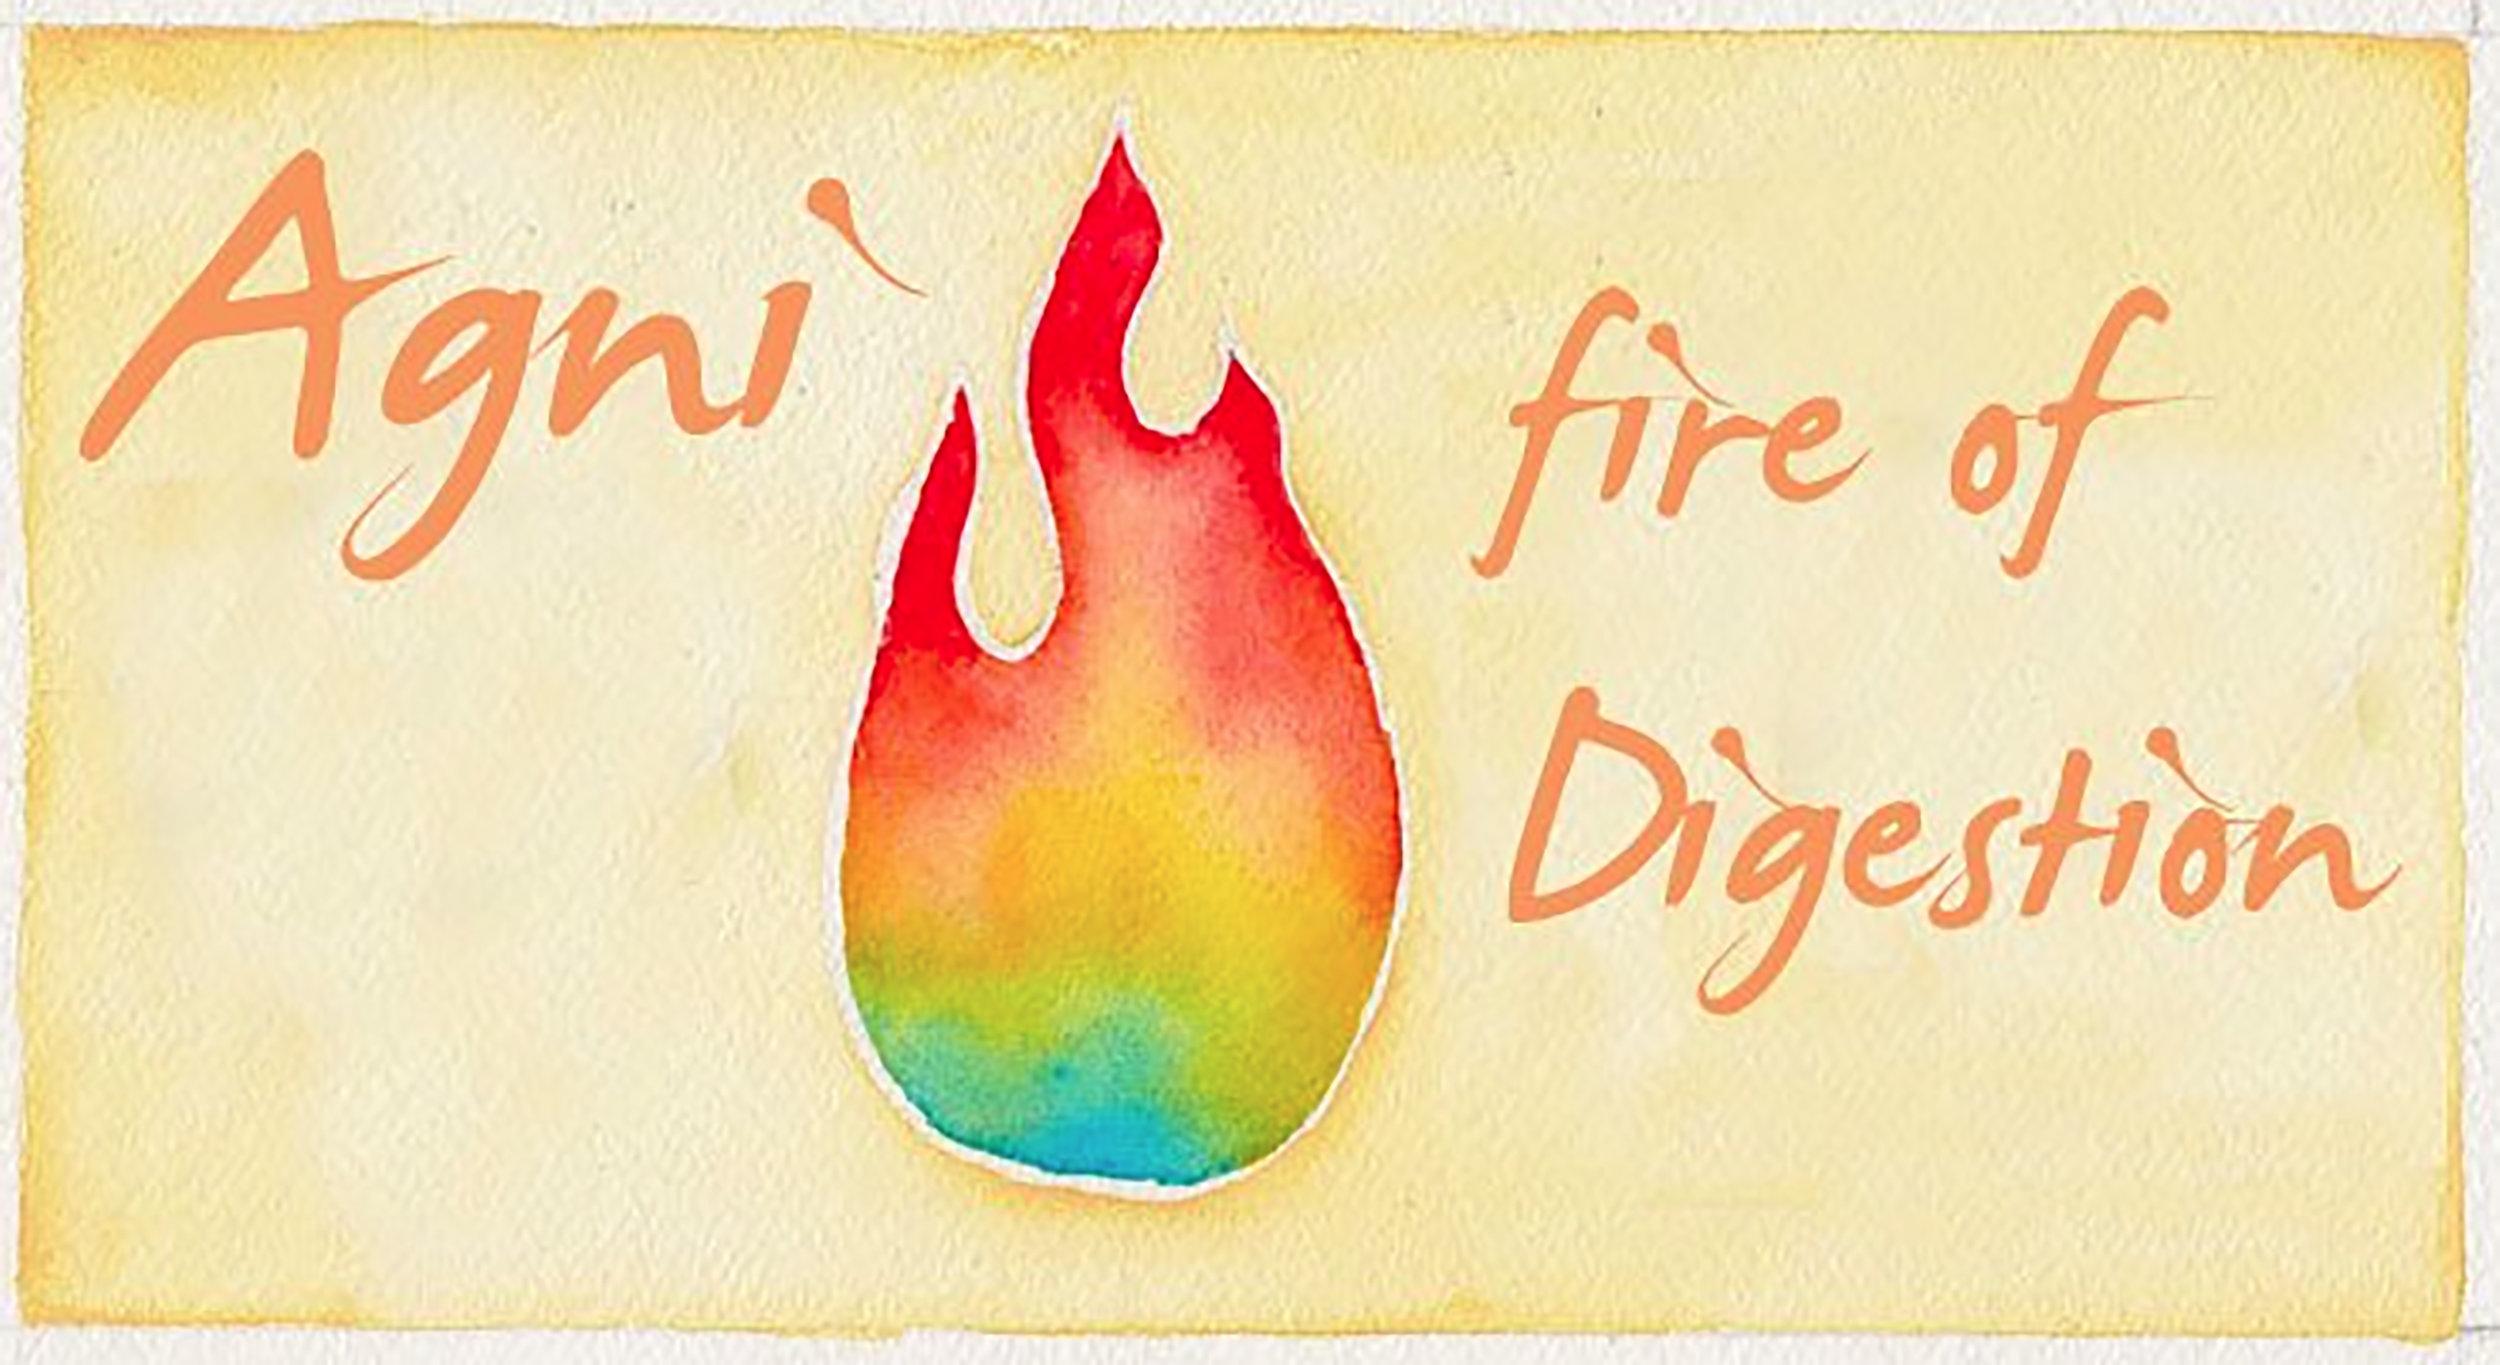 AGNI-FIRE-SUSAN.jpg